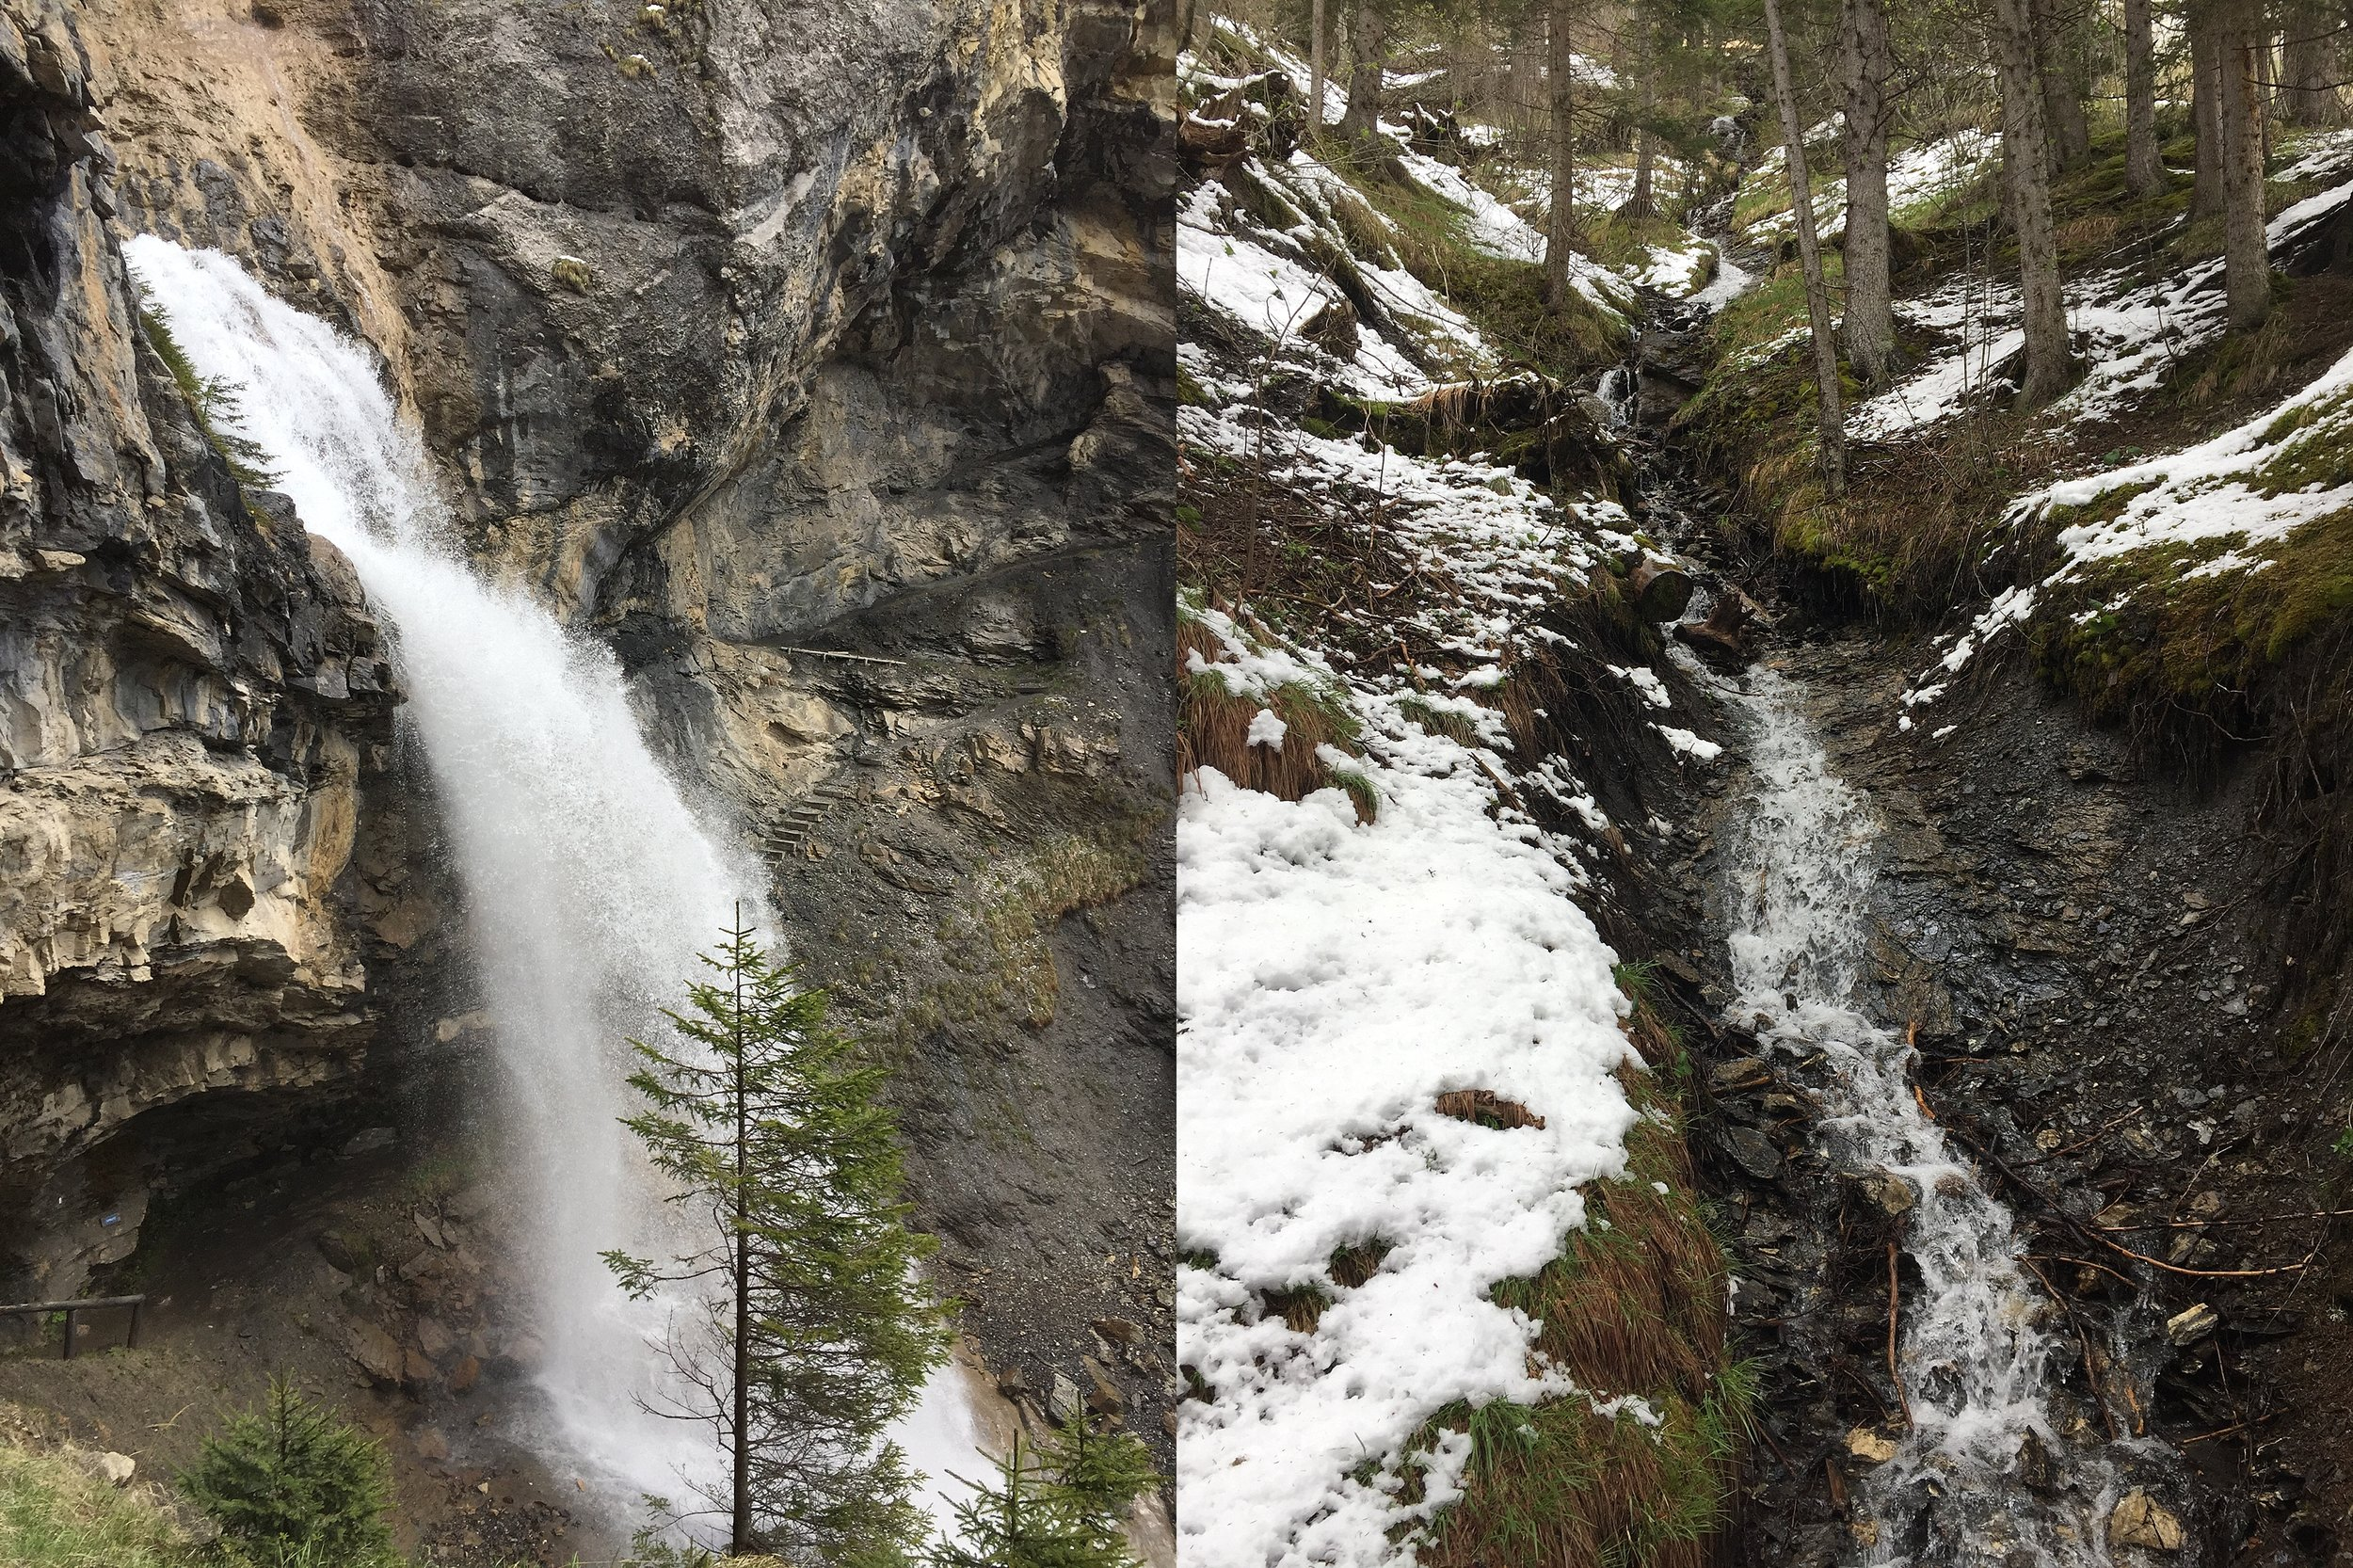 North Face Trail_0012.jpg